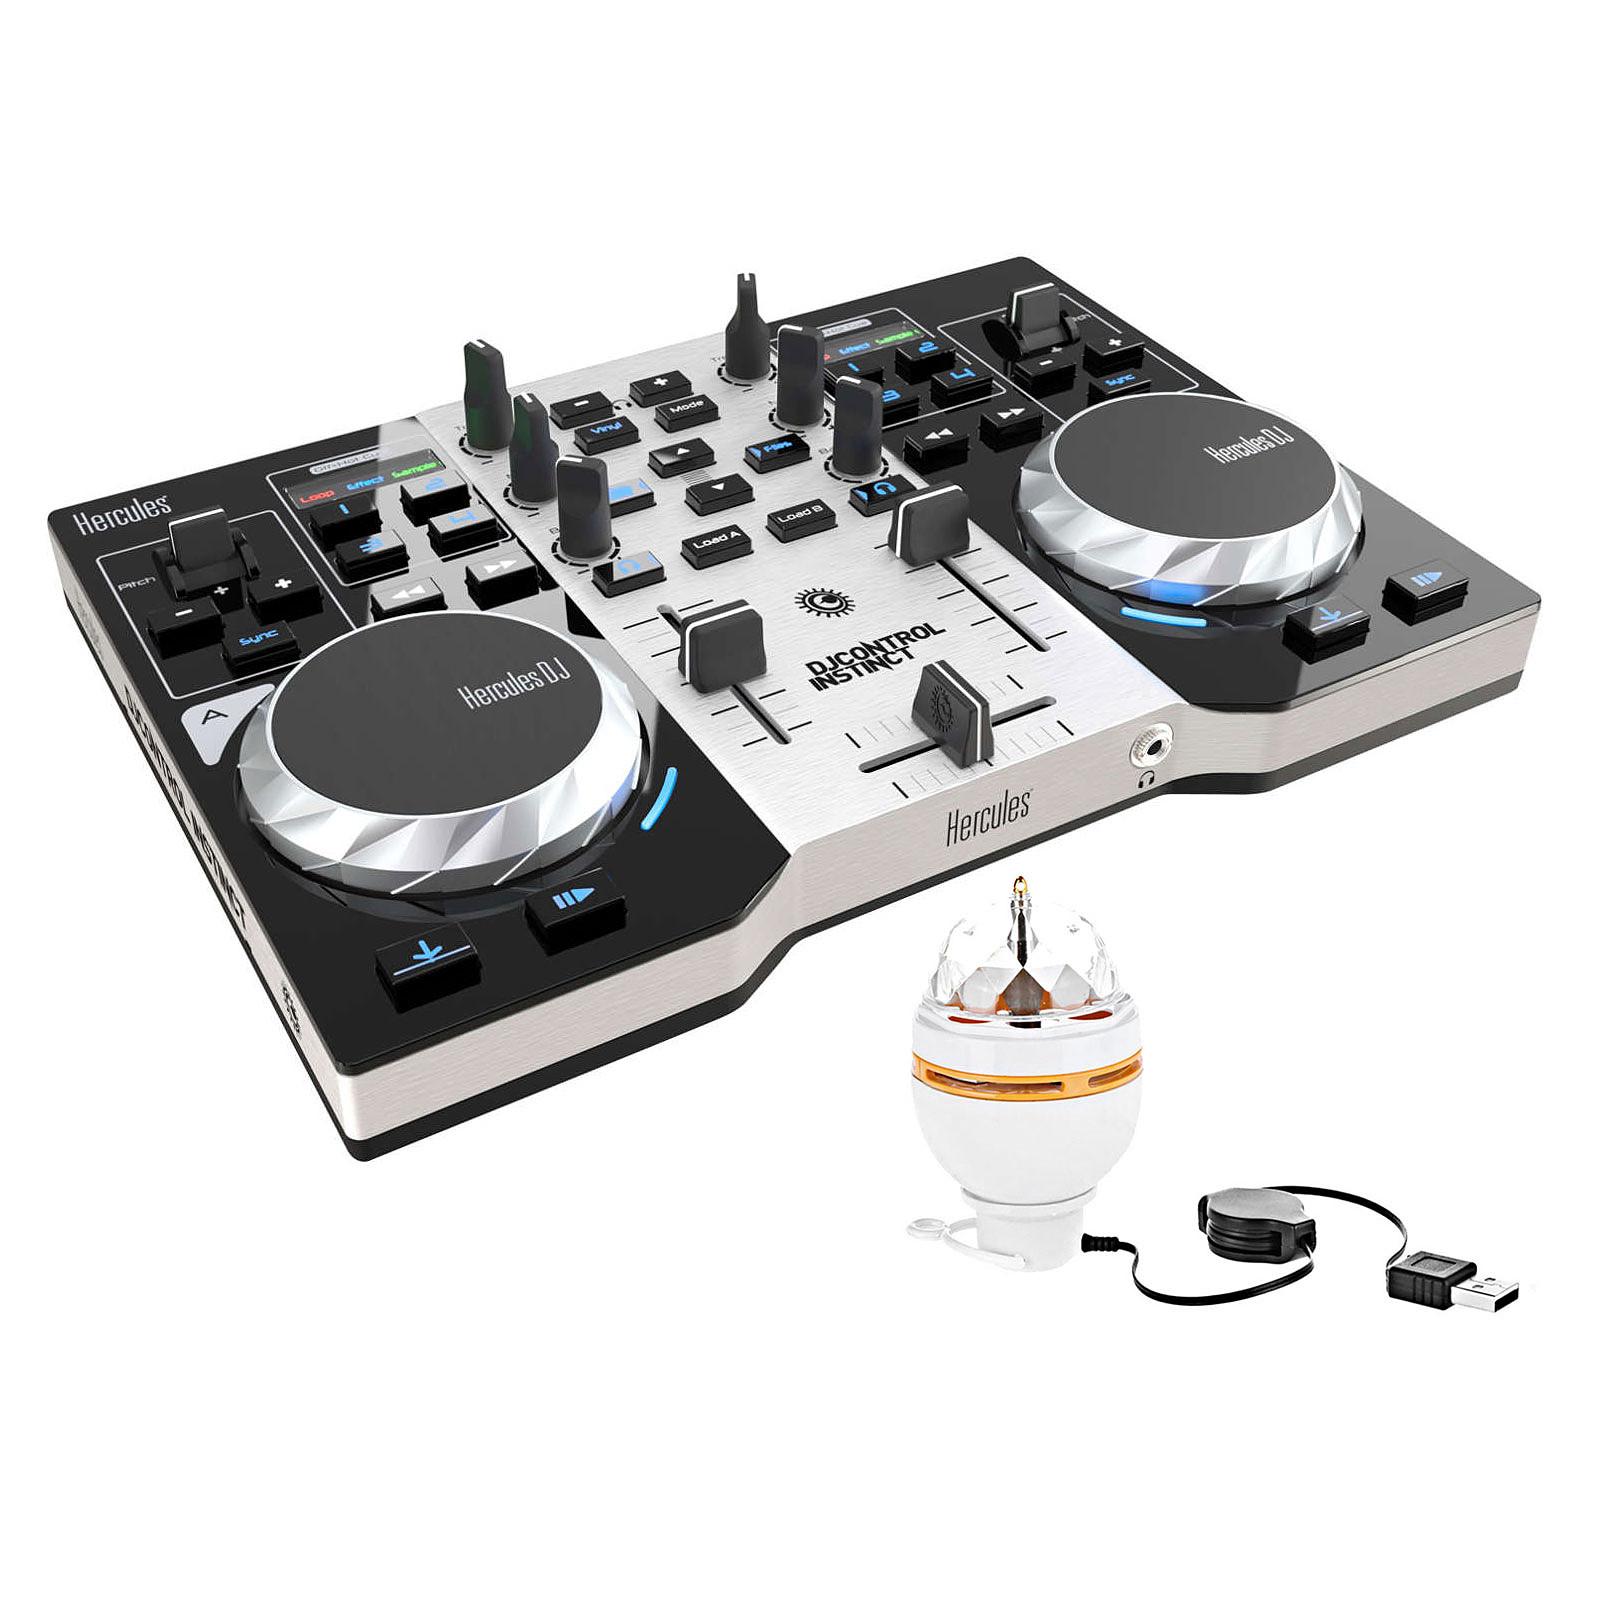 Hercules DJControl Instinct Party Pack